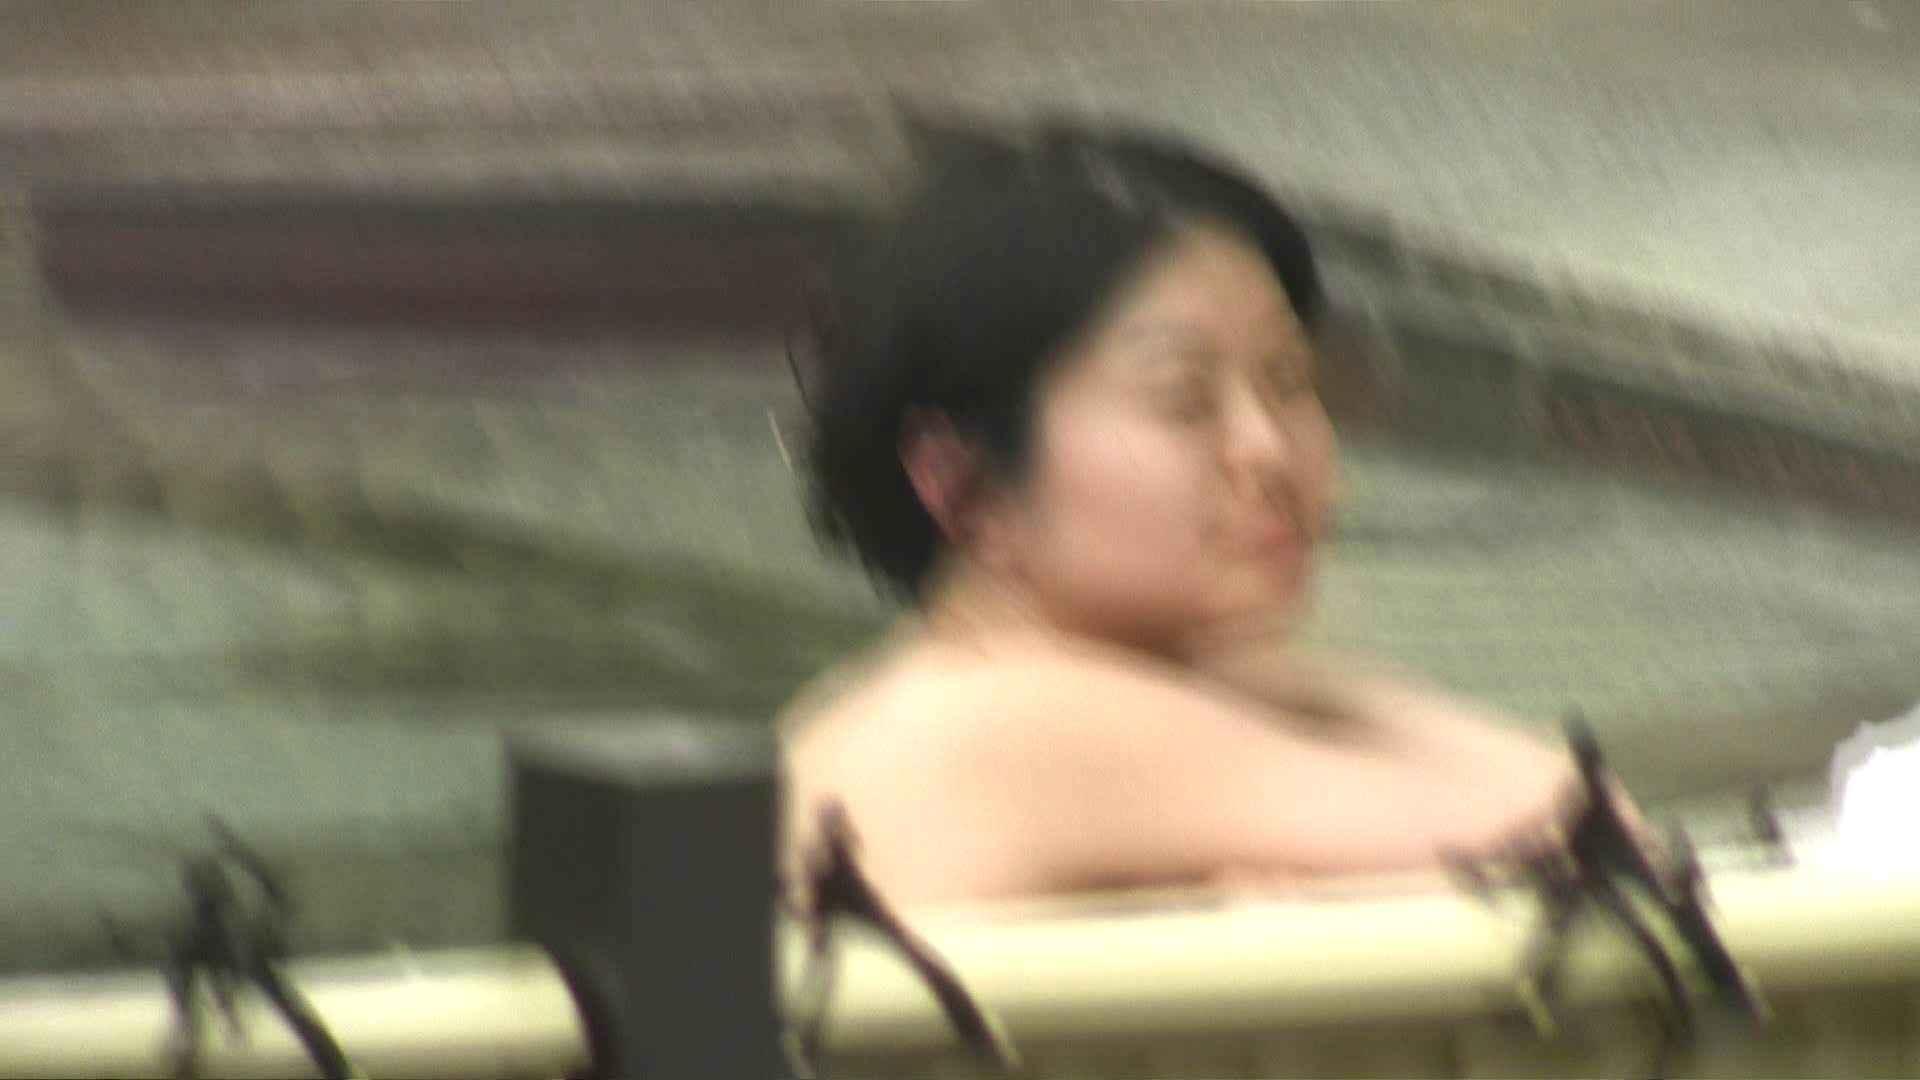 Aquaな露天風呂Vol.675 露天風呂編  91PIX 26